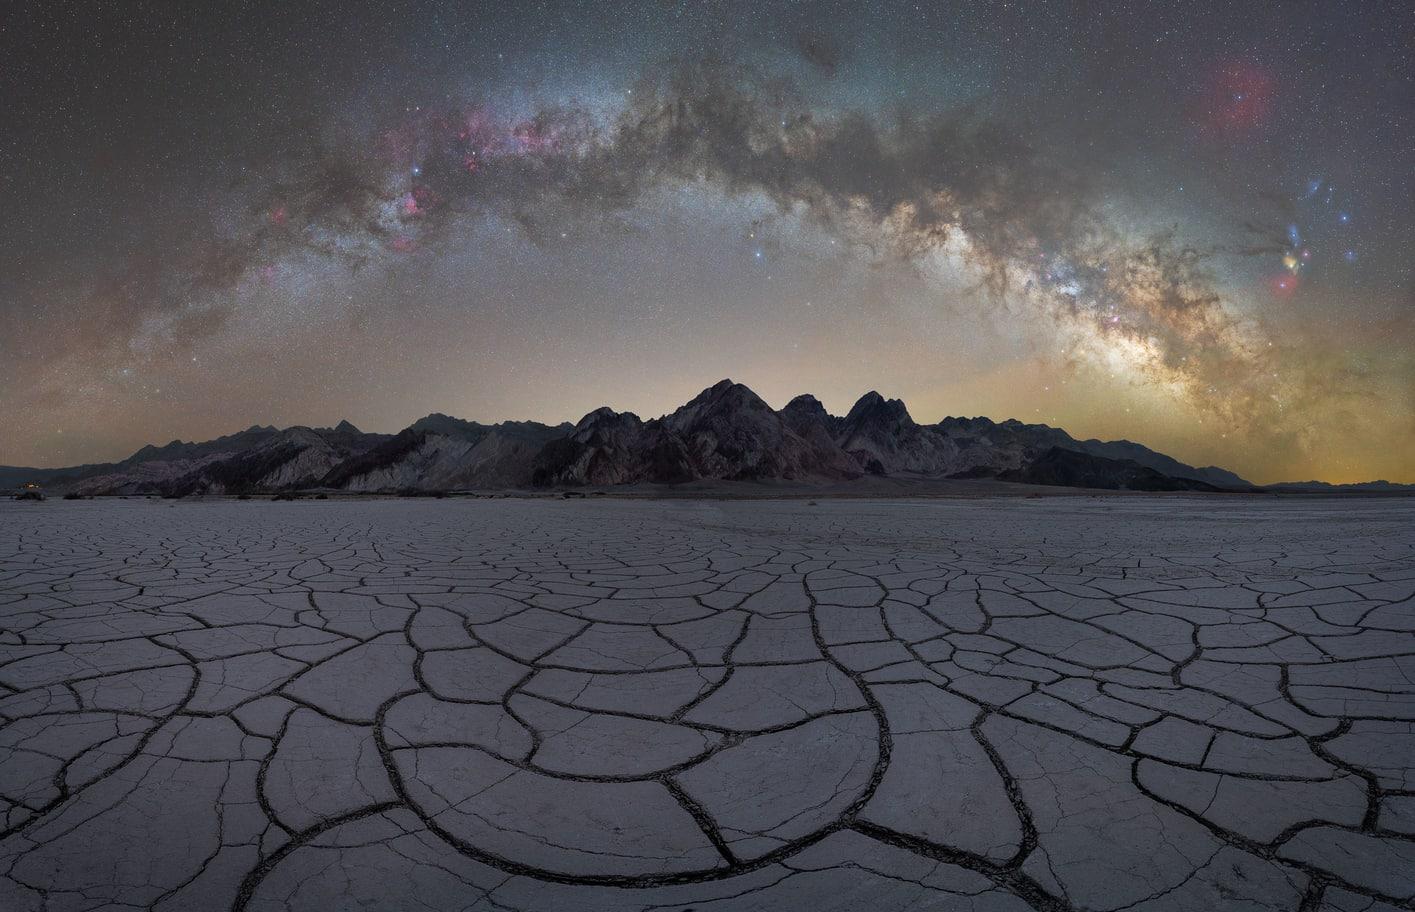 Mejor balance de blancos para fotografiar la Vía Láctea